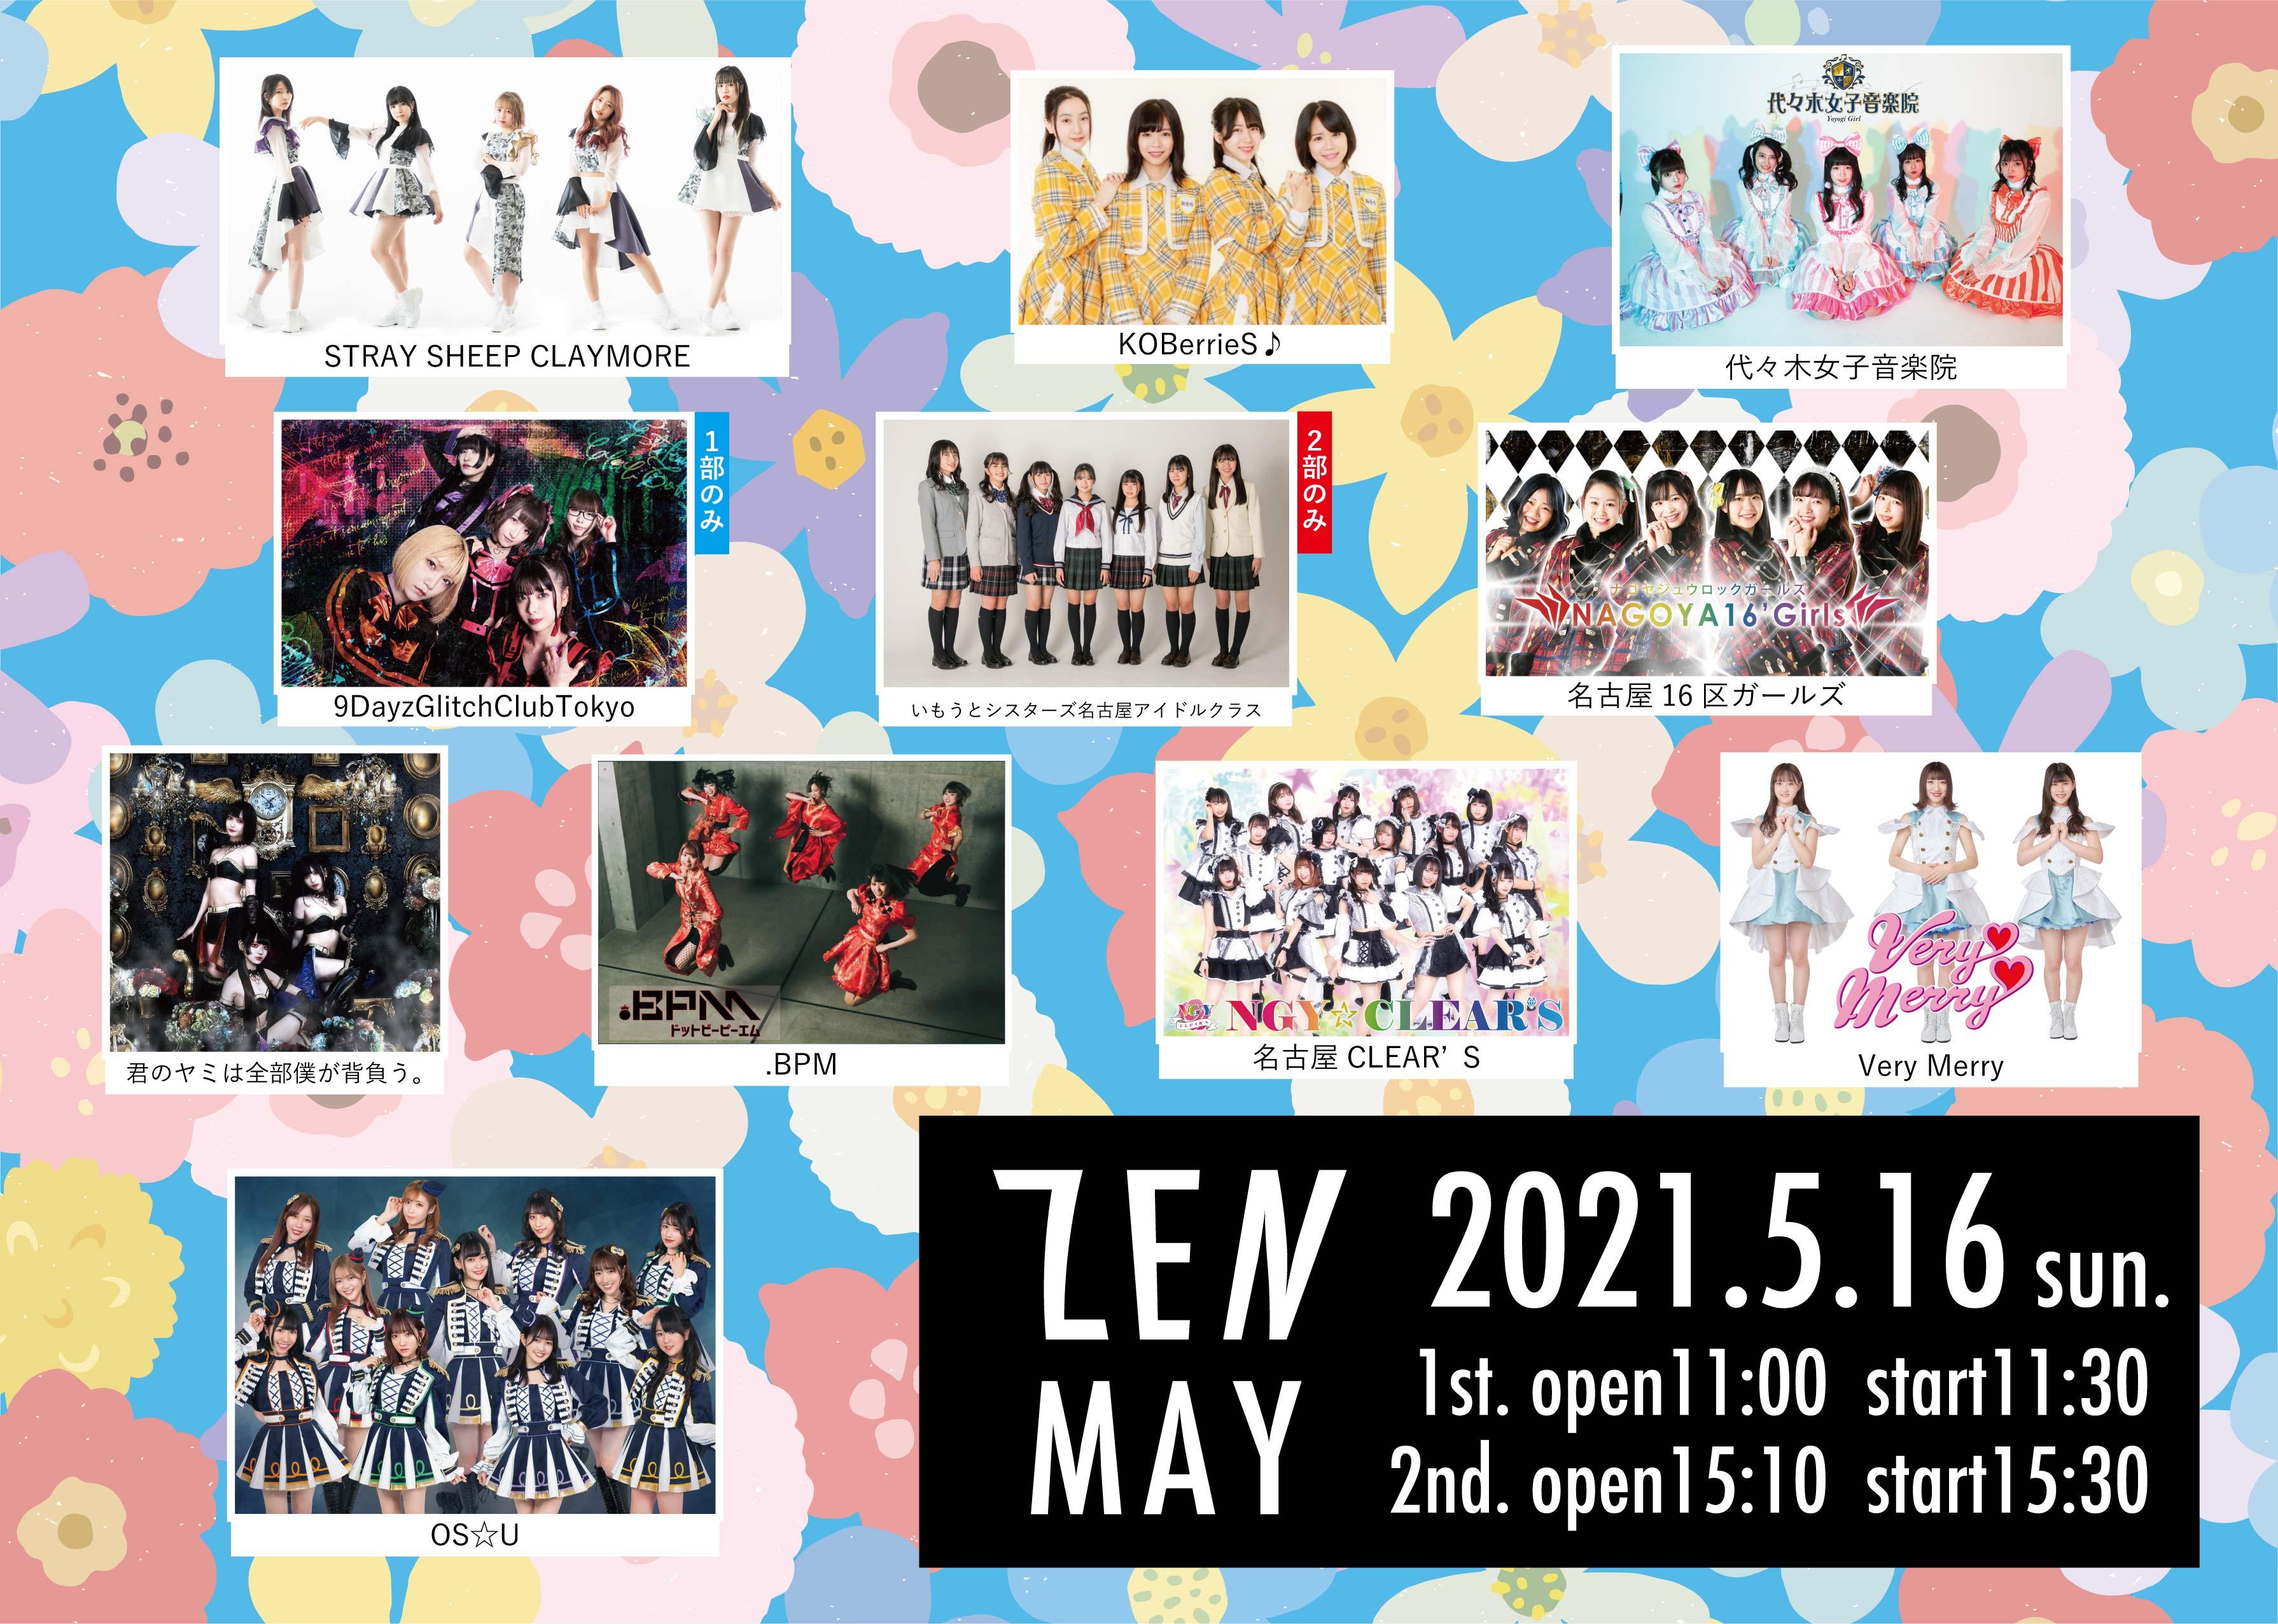 『ZEN MAY vol.1』 名古屋X-HALL-ZEN-で開催するアイドルライブ!